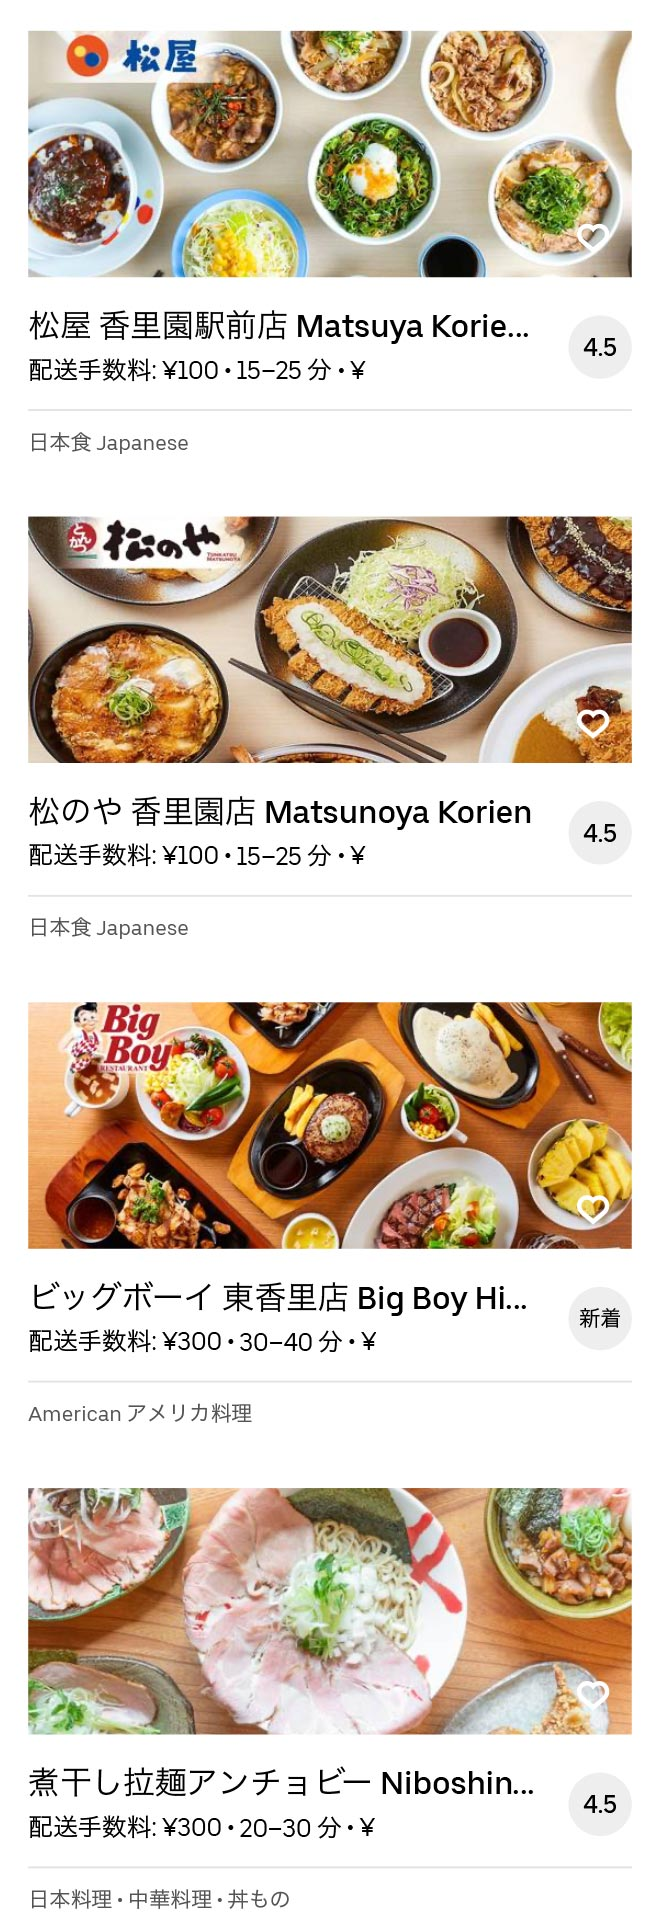 Neyagawa kourien menu 2006 04